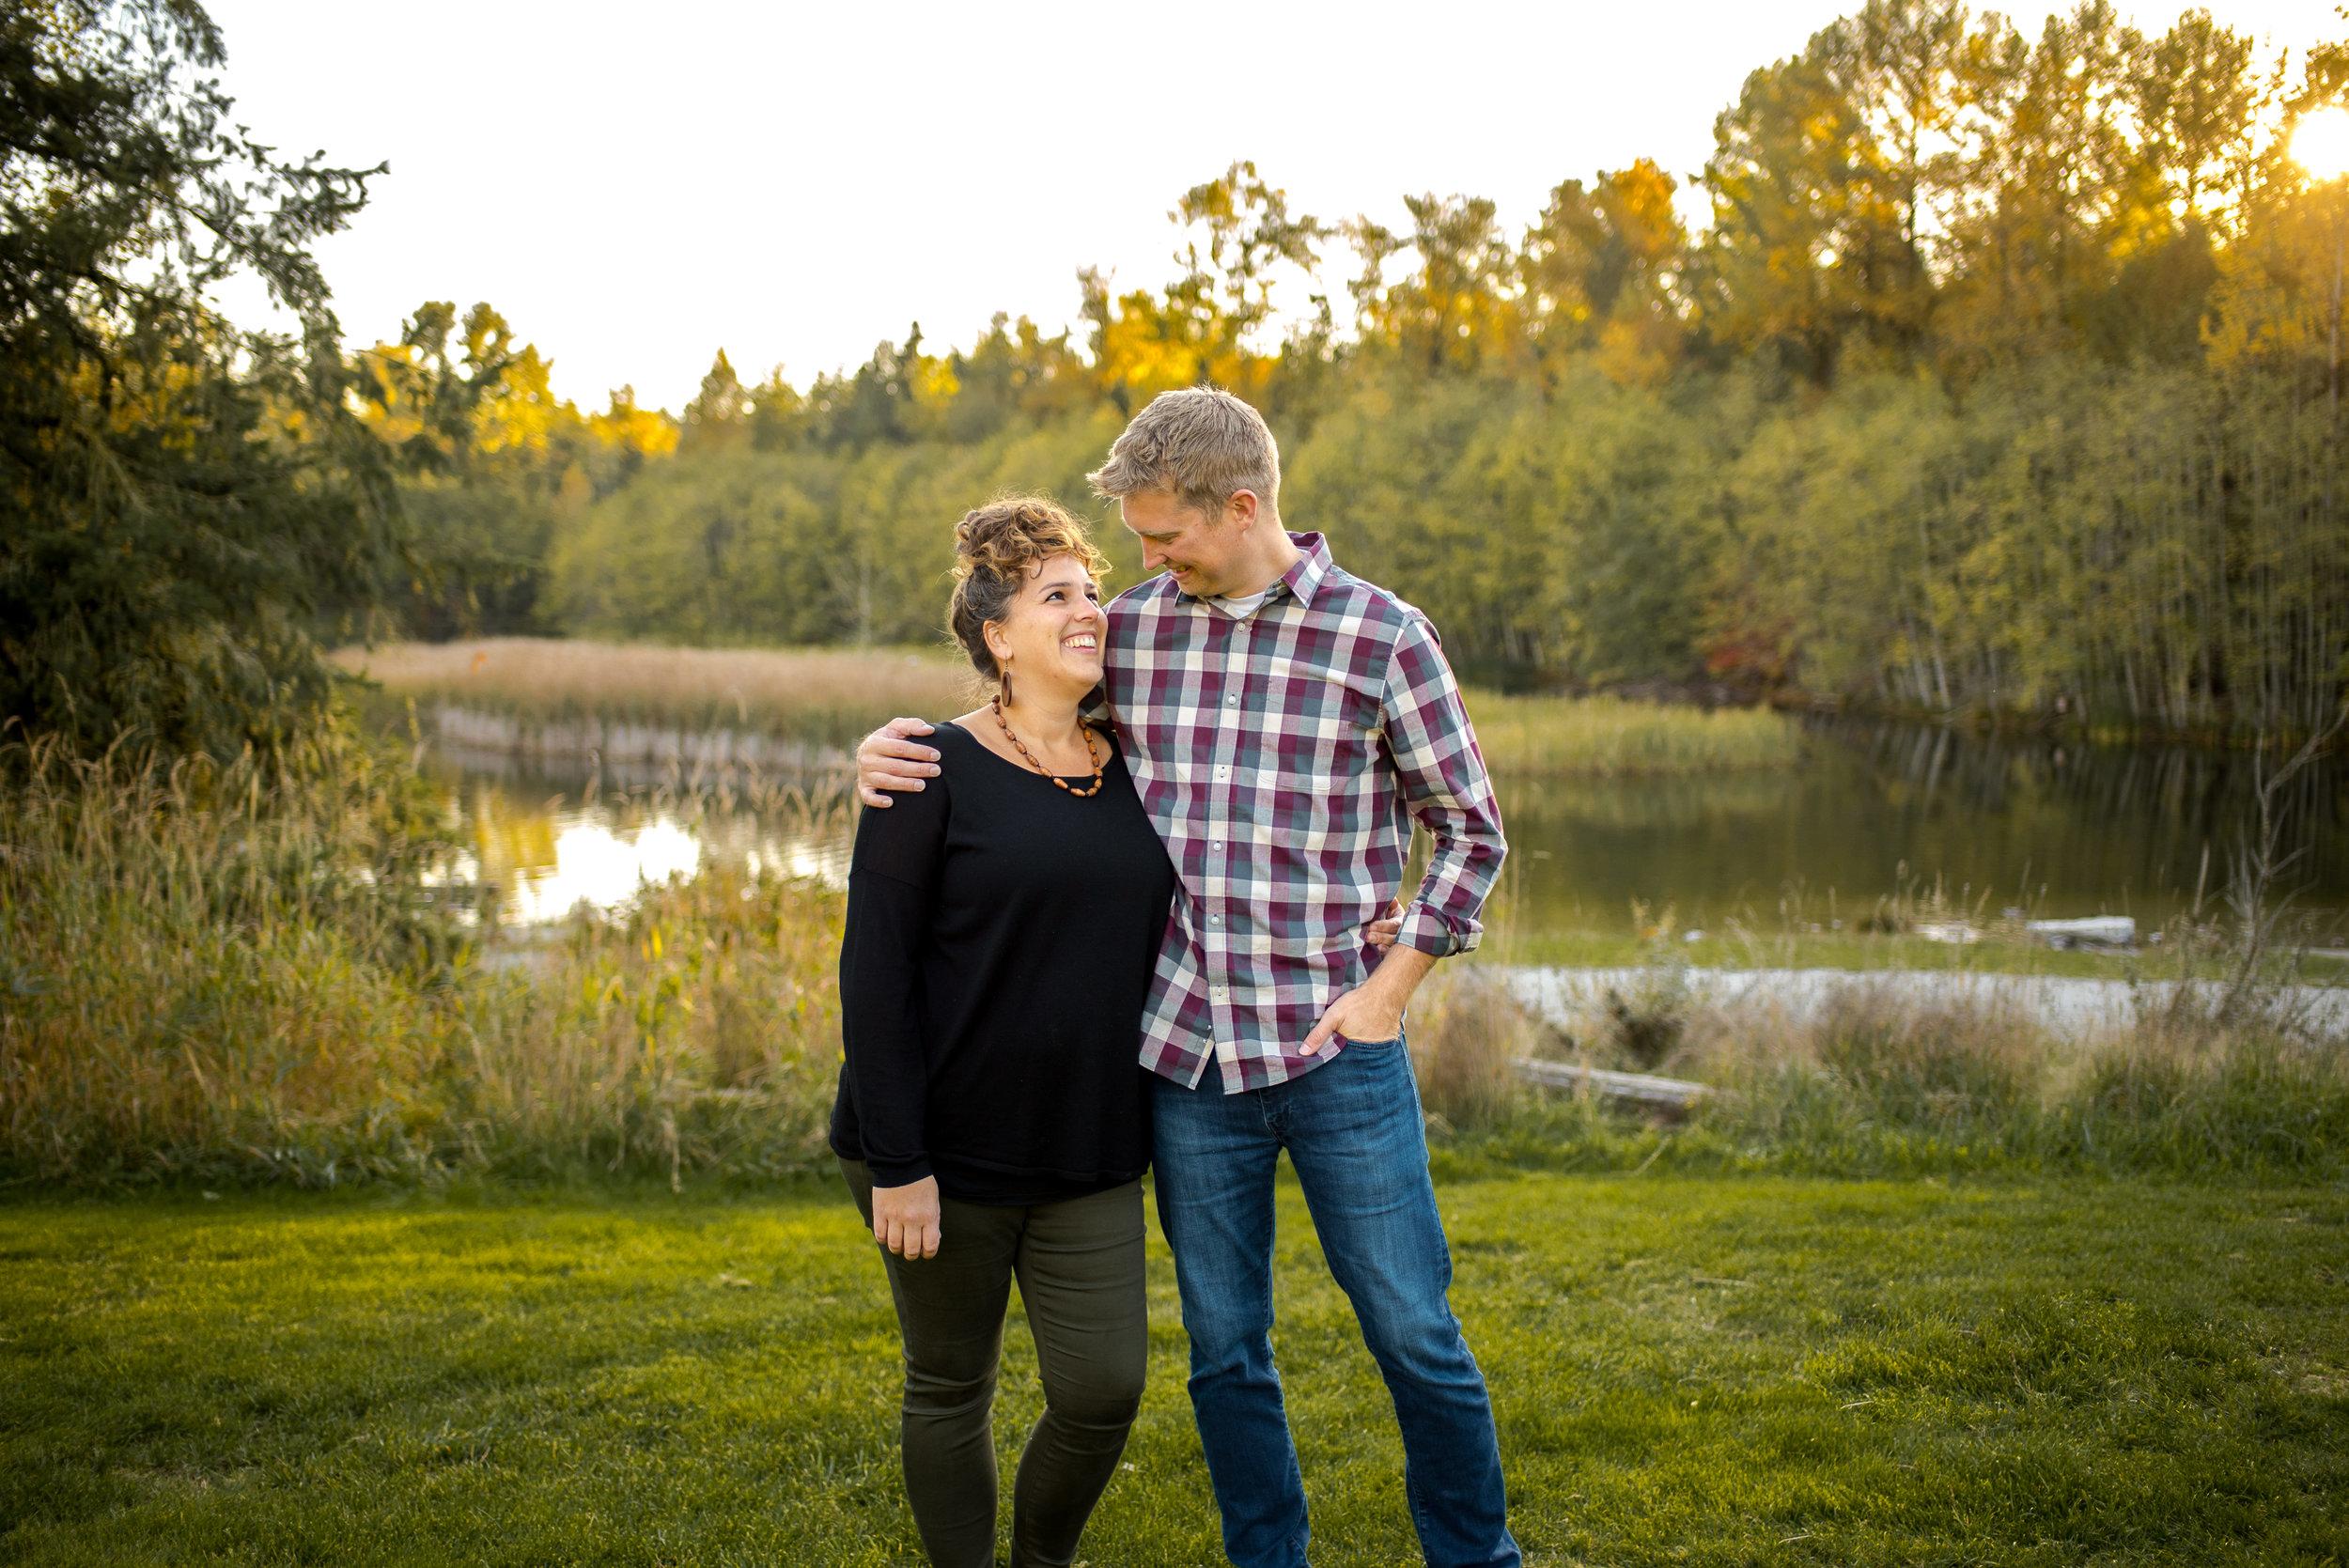 Green Timbers Park Family Photographer12.JPG